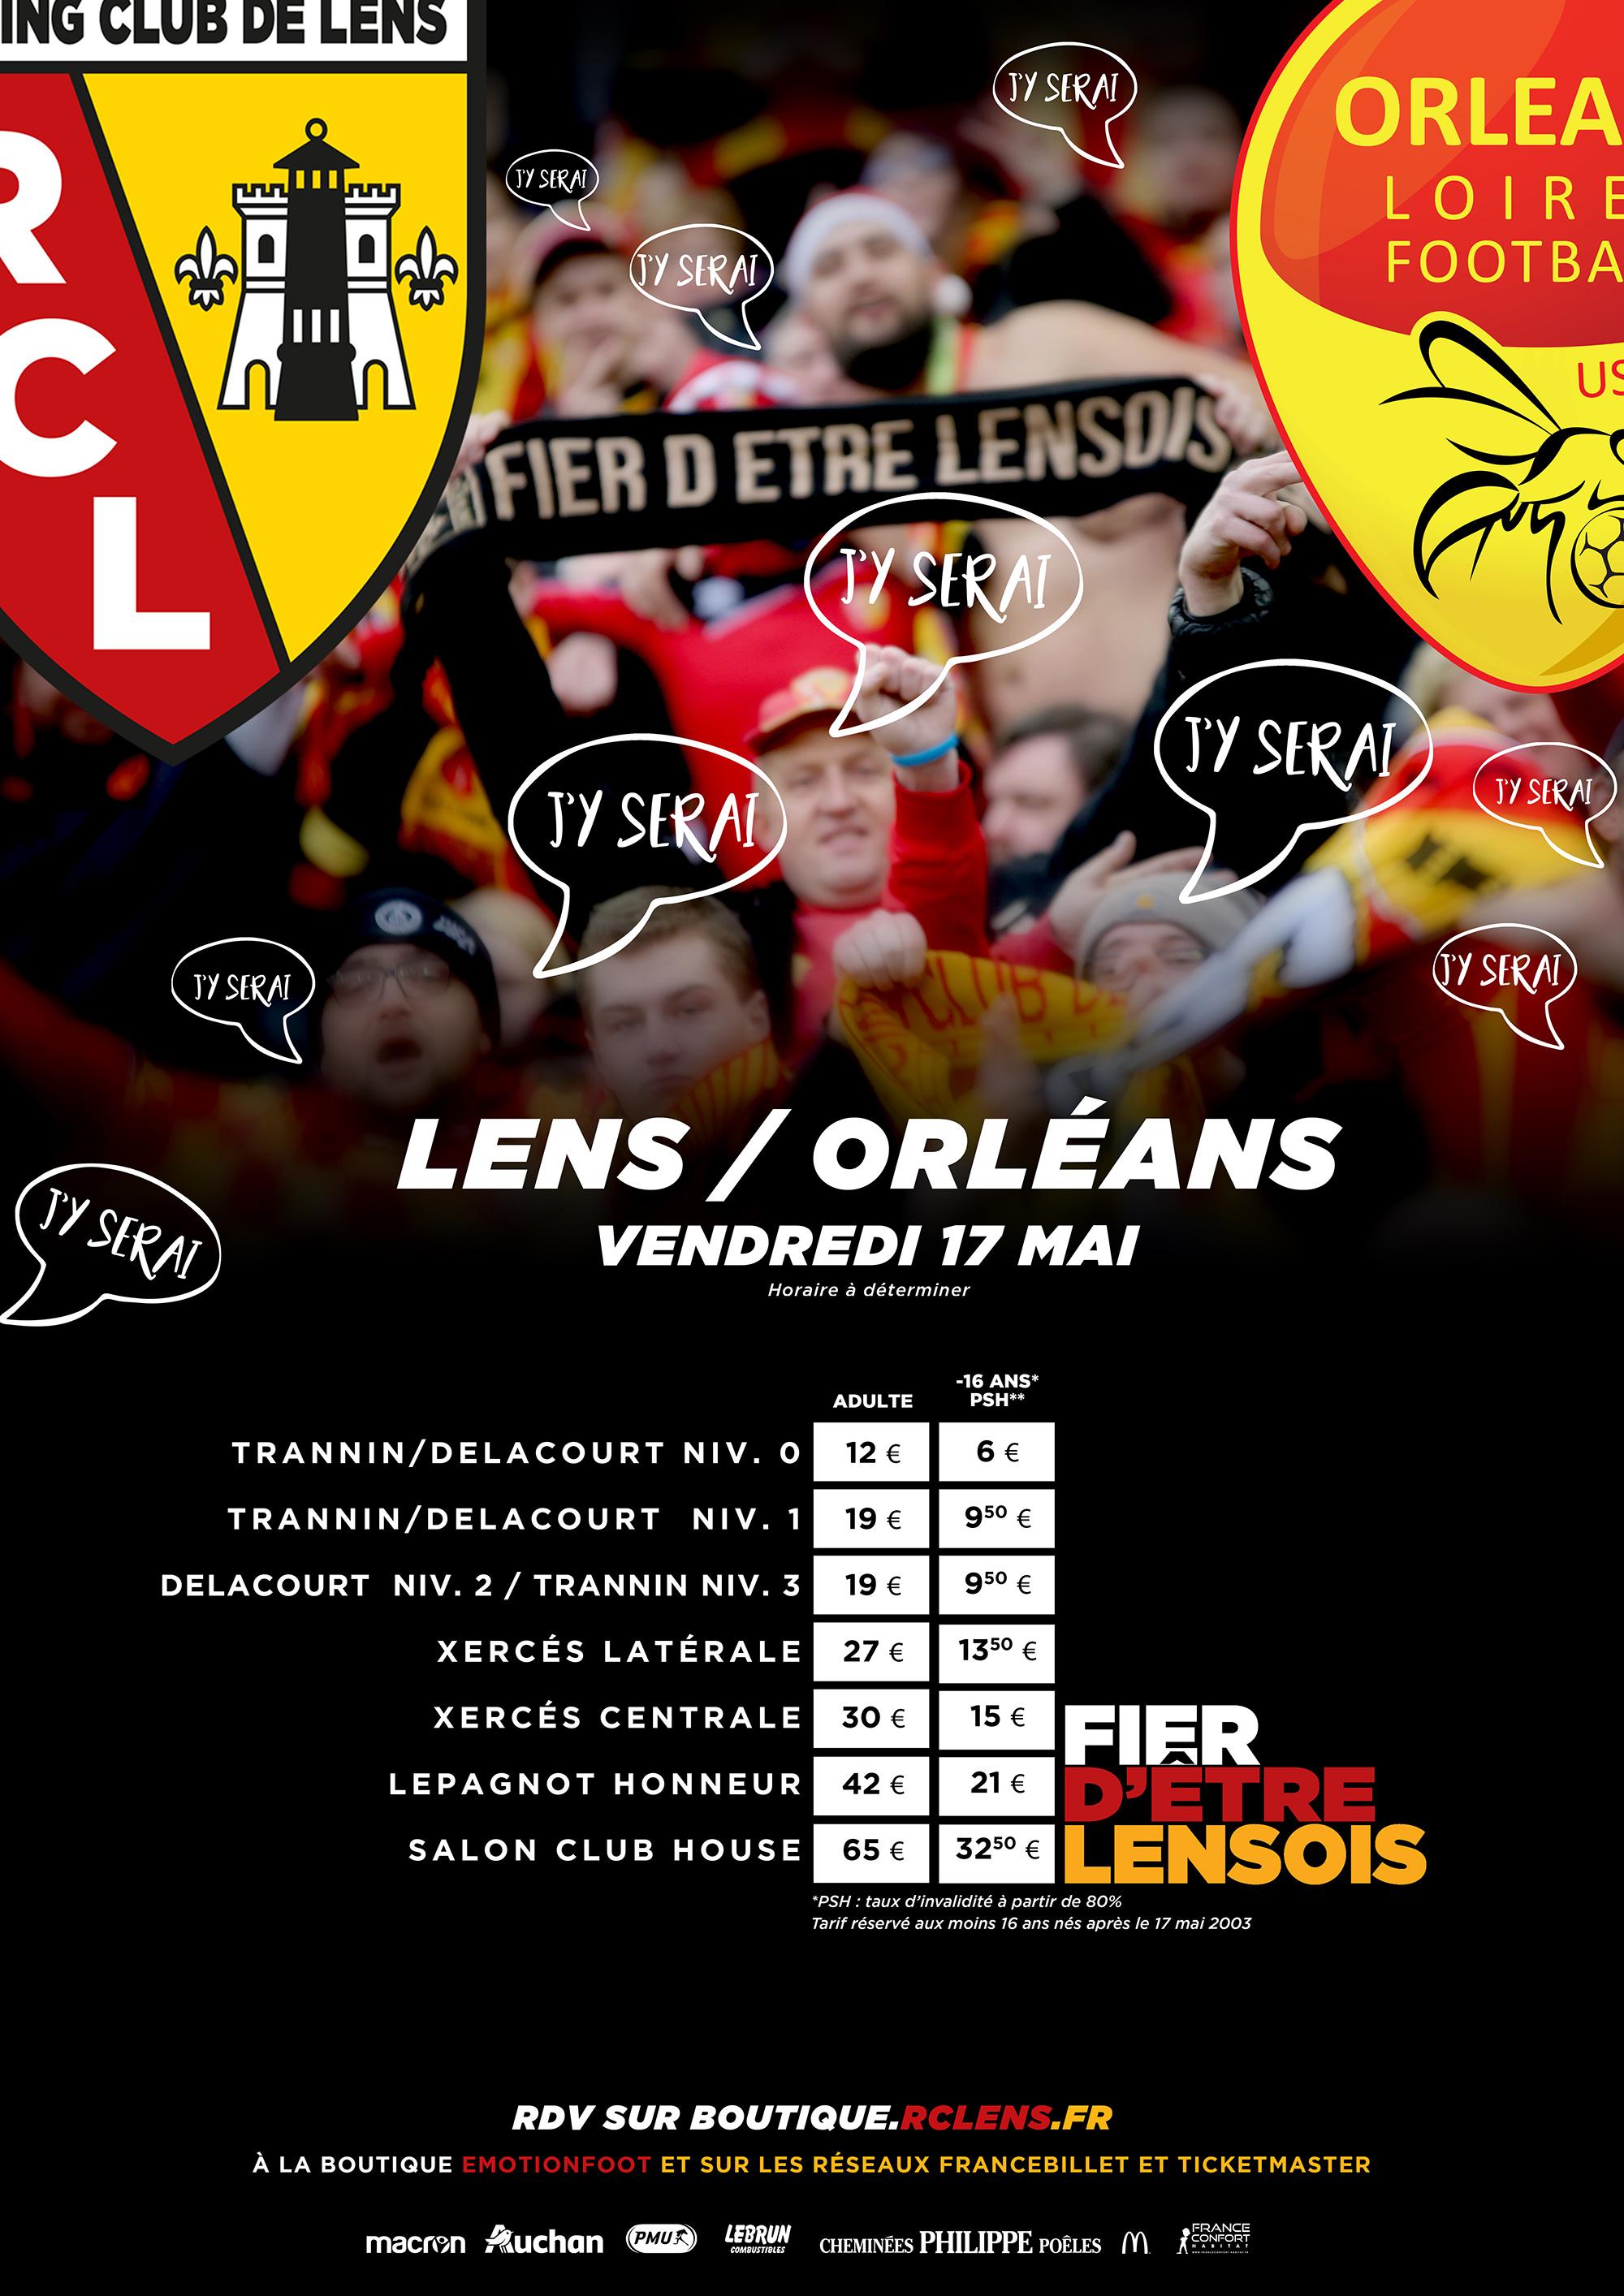 Lens - Orléans billetterie tarifs